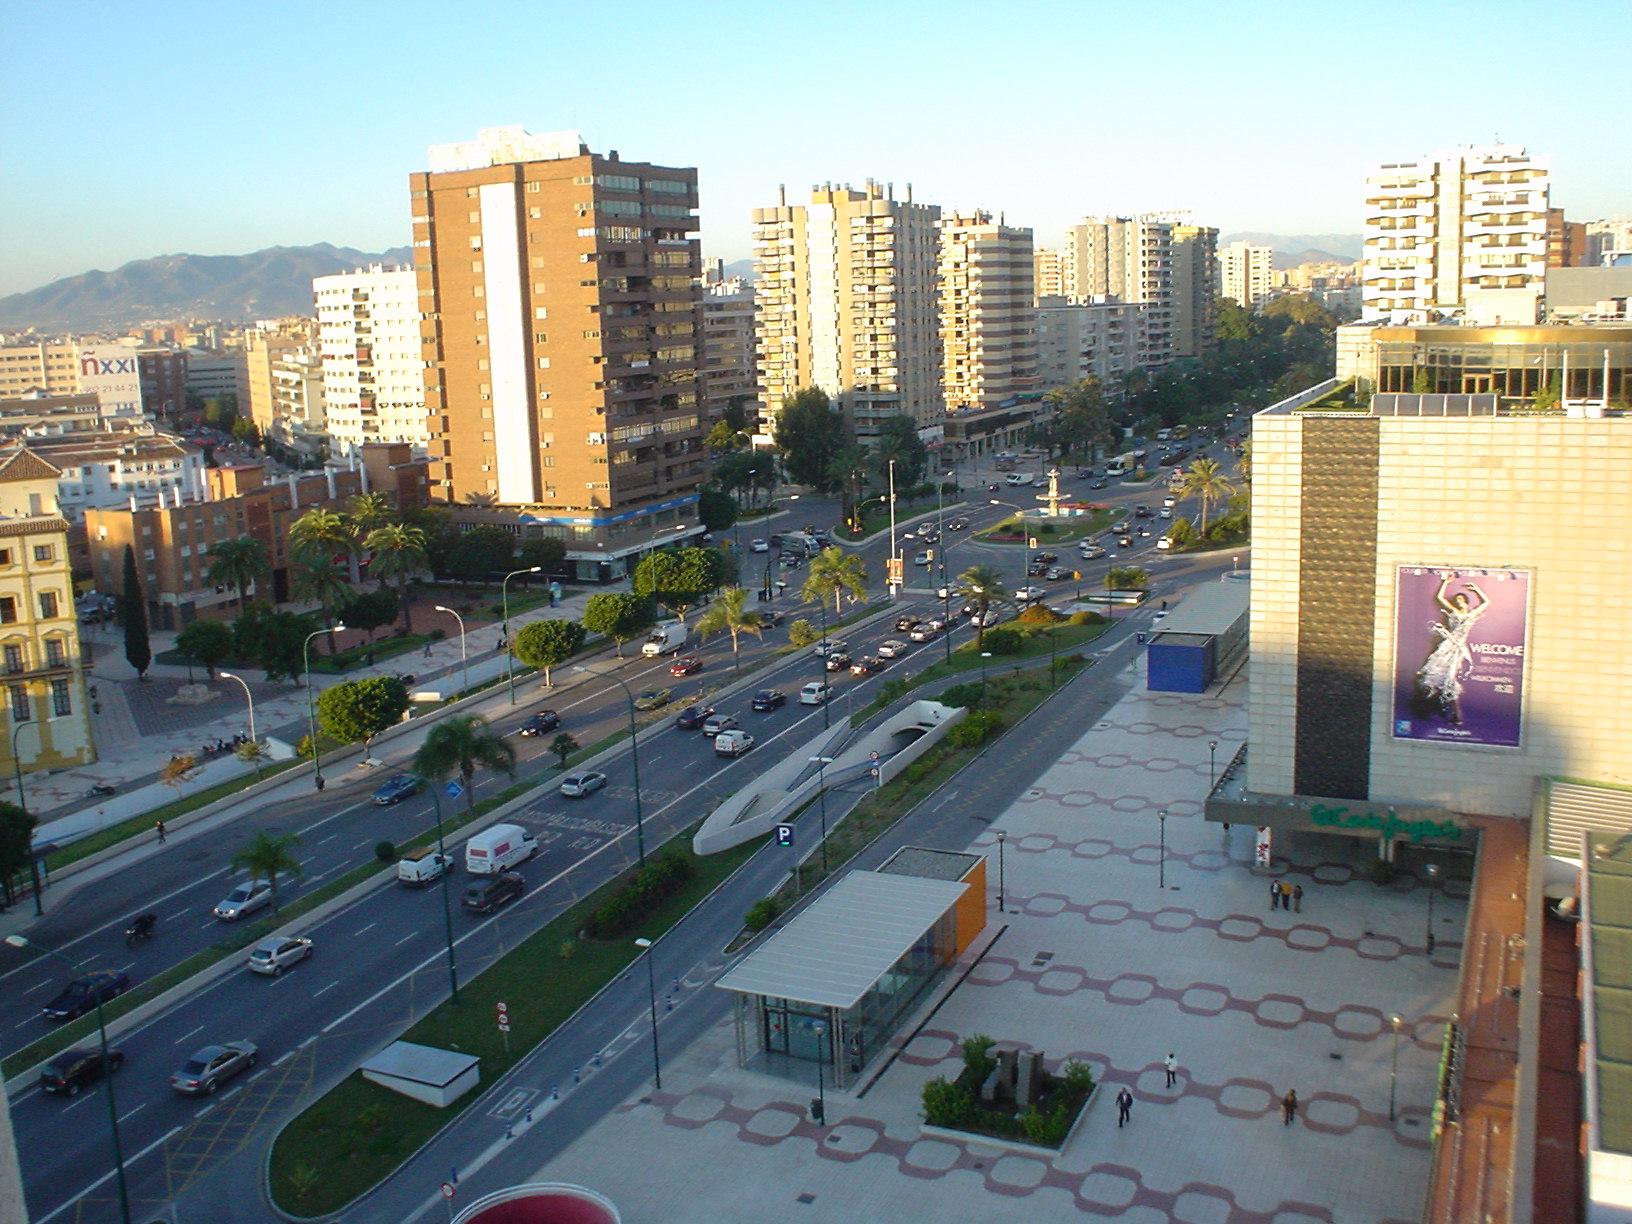 Malaga ciudad moderna fotos de m laga capital - Fotos malaga capital ...